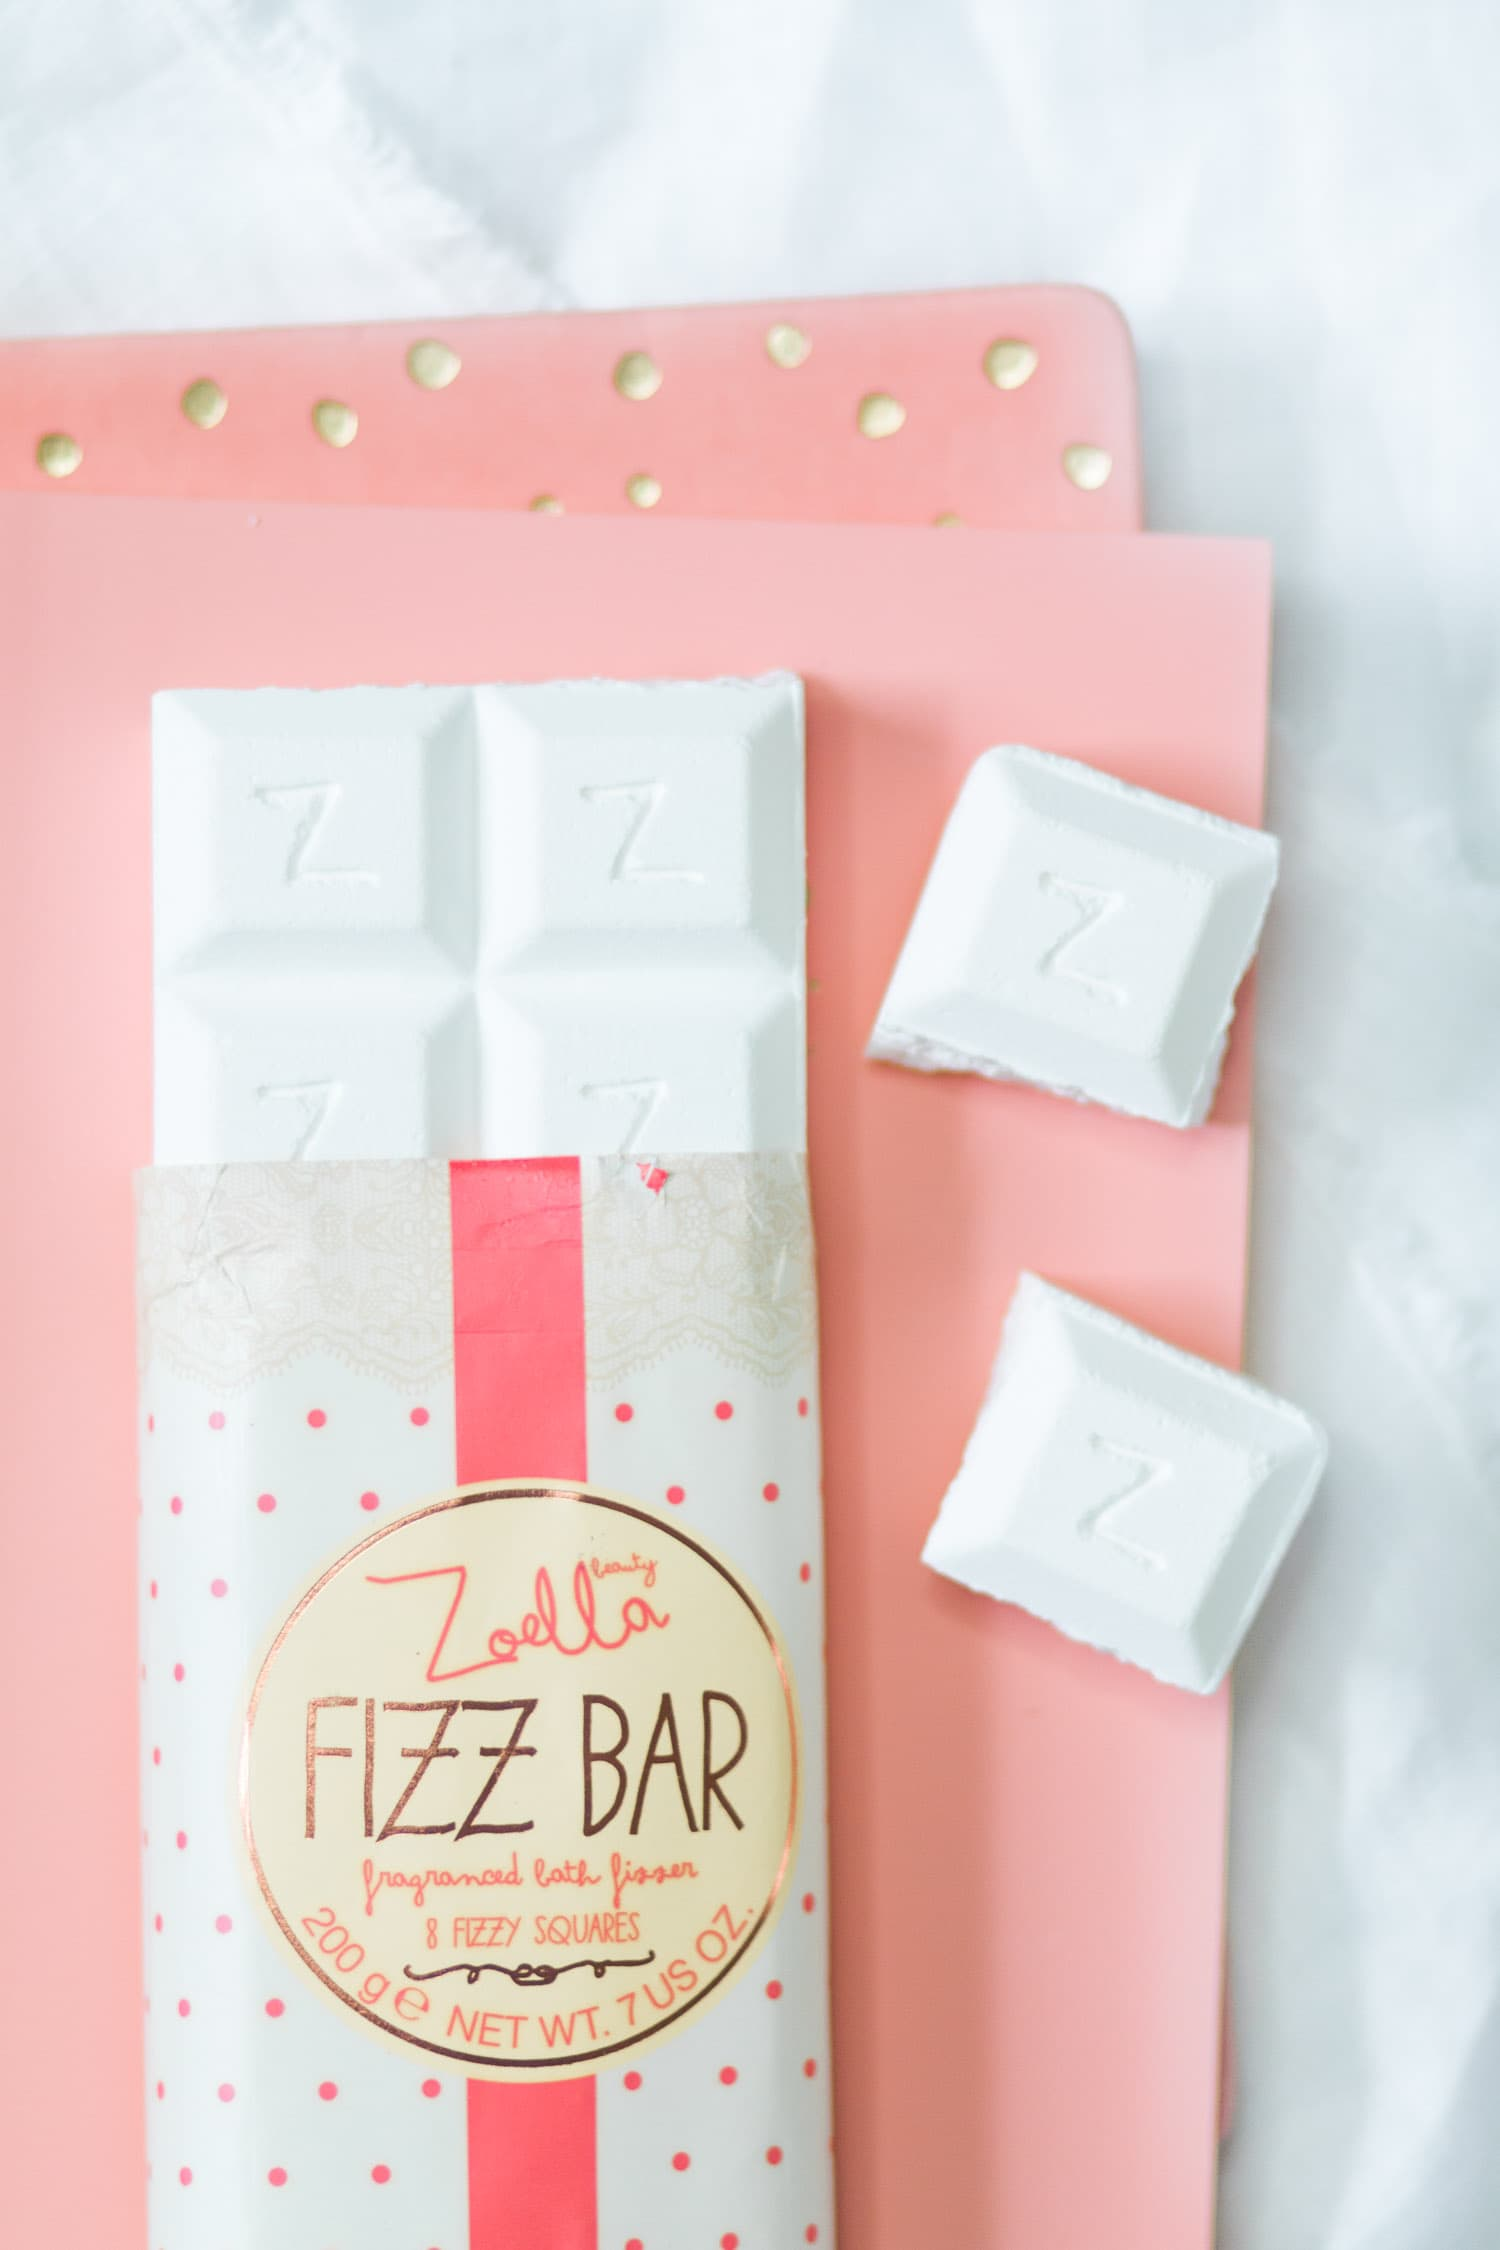 Zoella Beauty Fizz Bar fragranced bath fizzer | Review by beauty blogger Ashley Brooke Nicholas